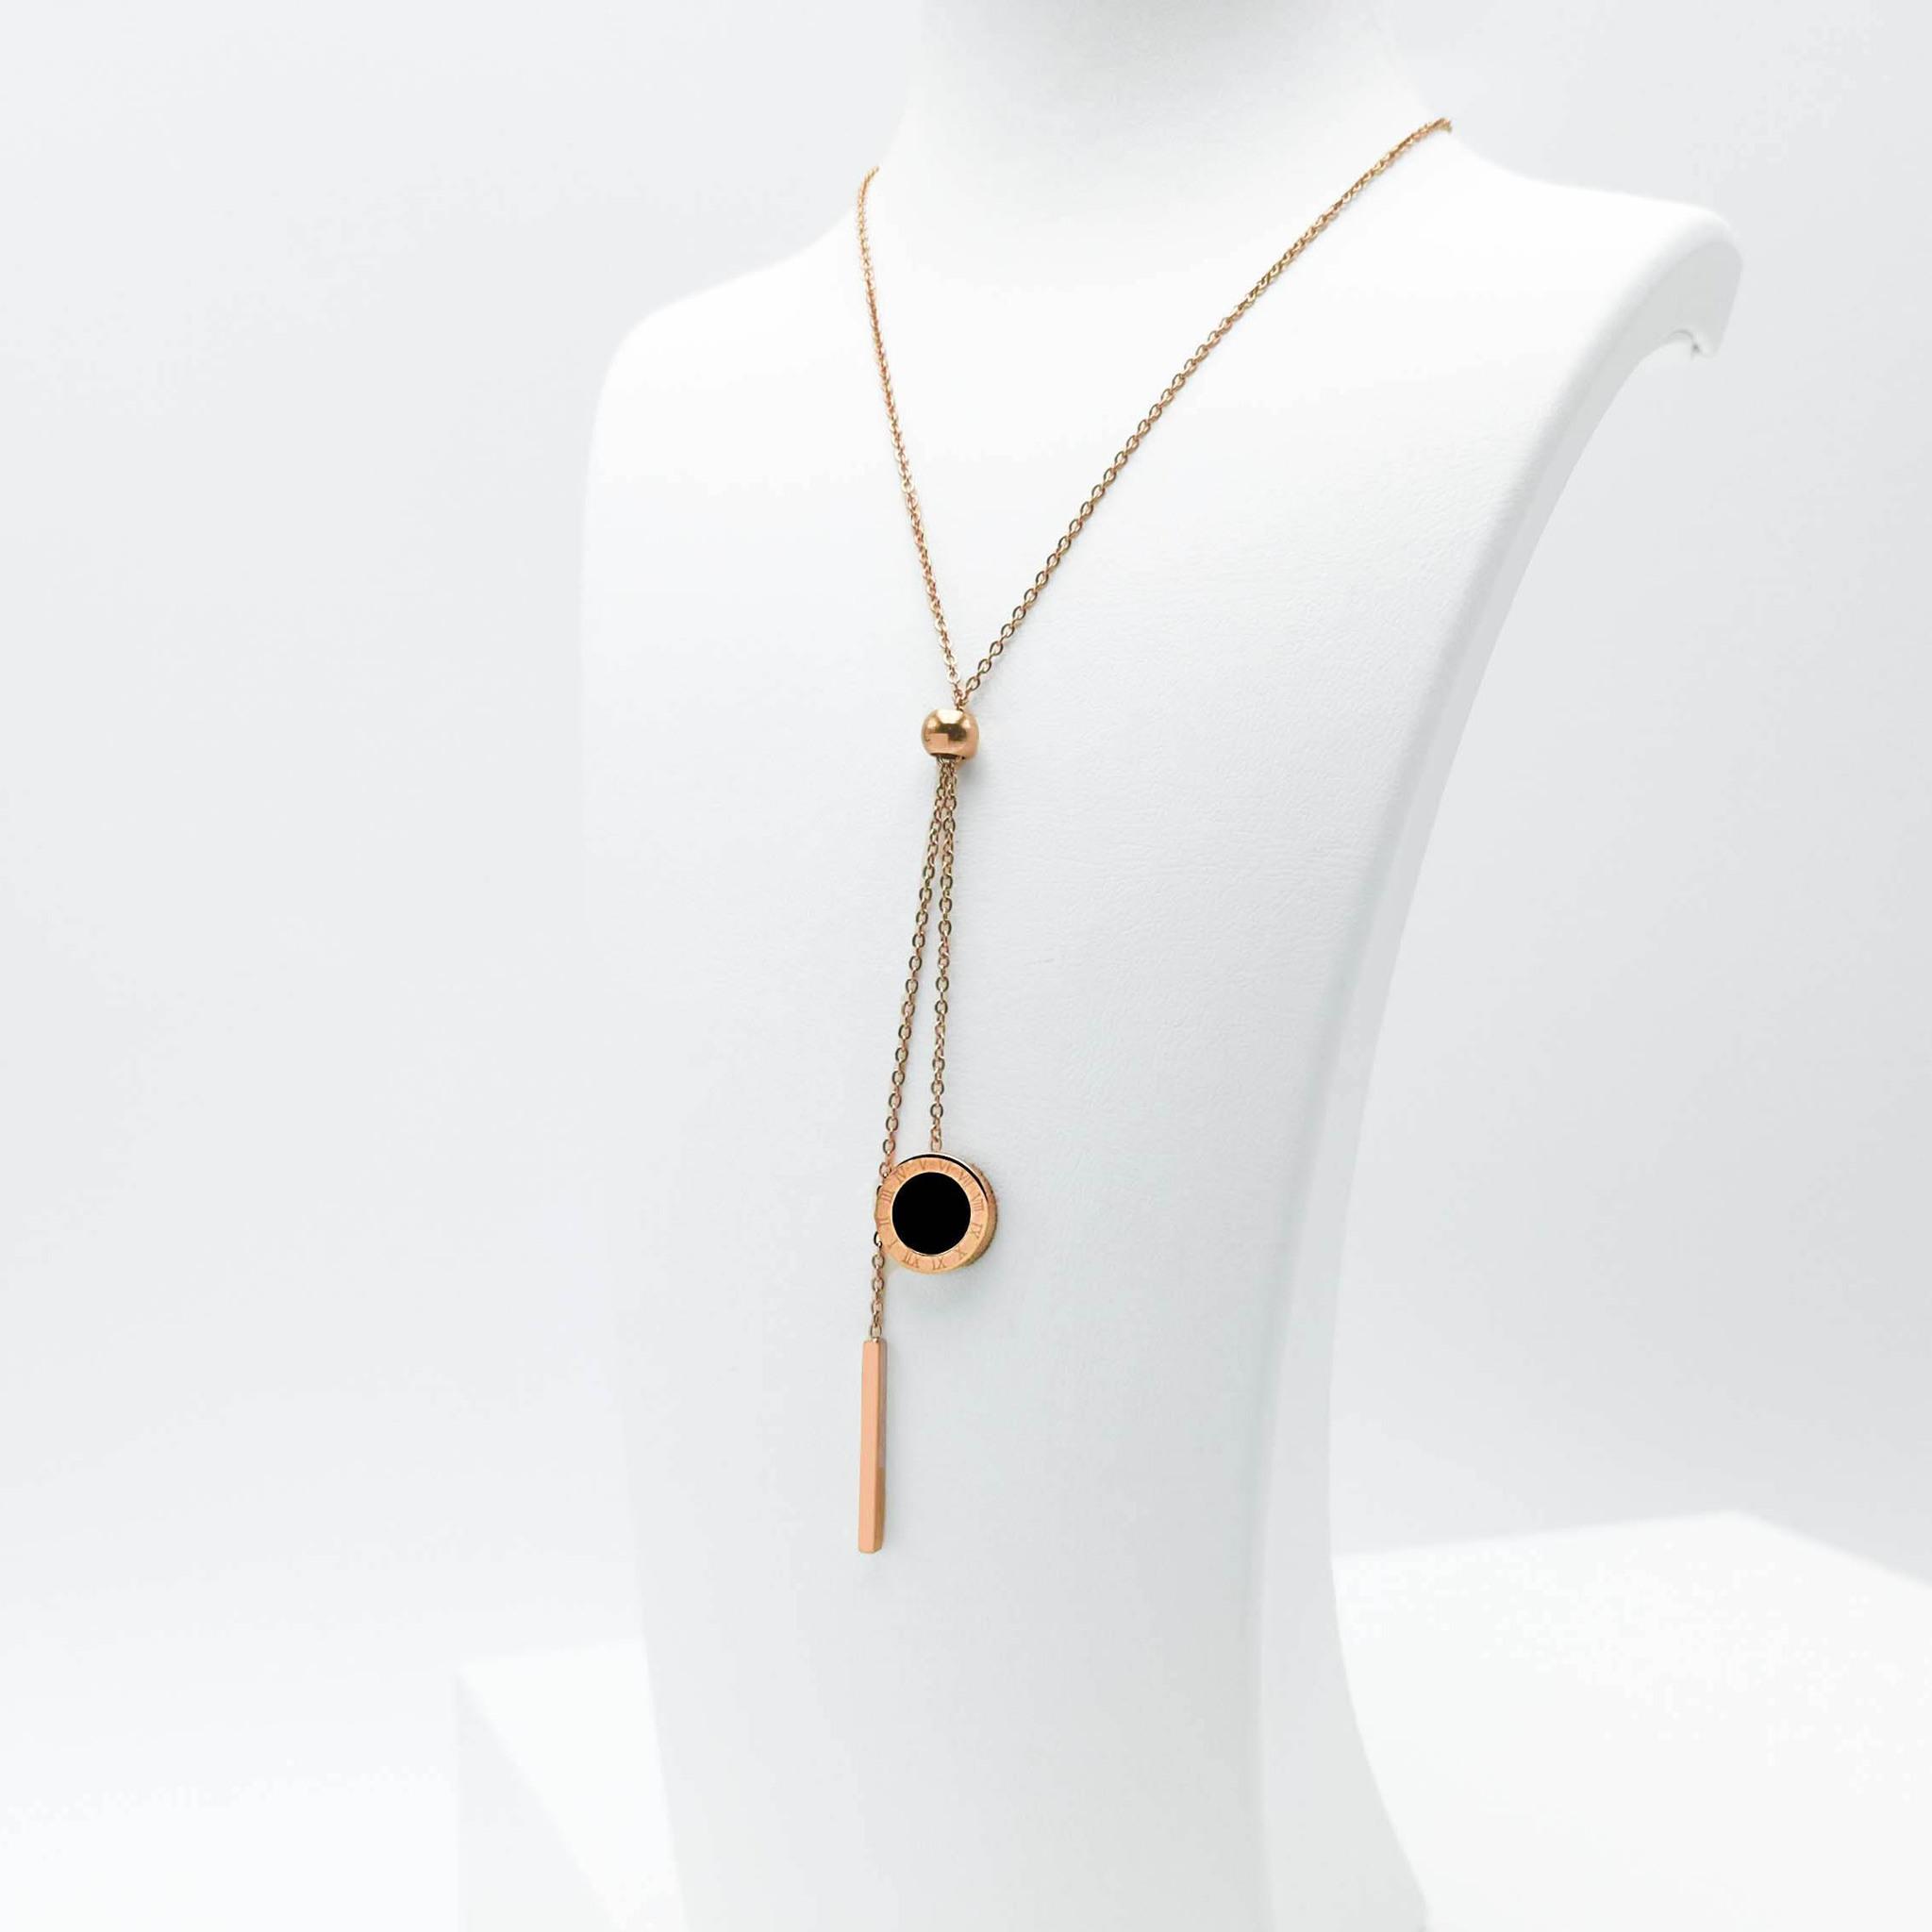 Era Elegance Grace Brace bild 2 Dam halsband. Modern, stilren och exklusive Smycke.